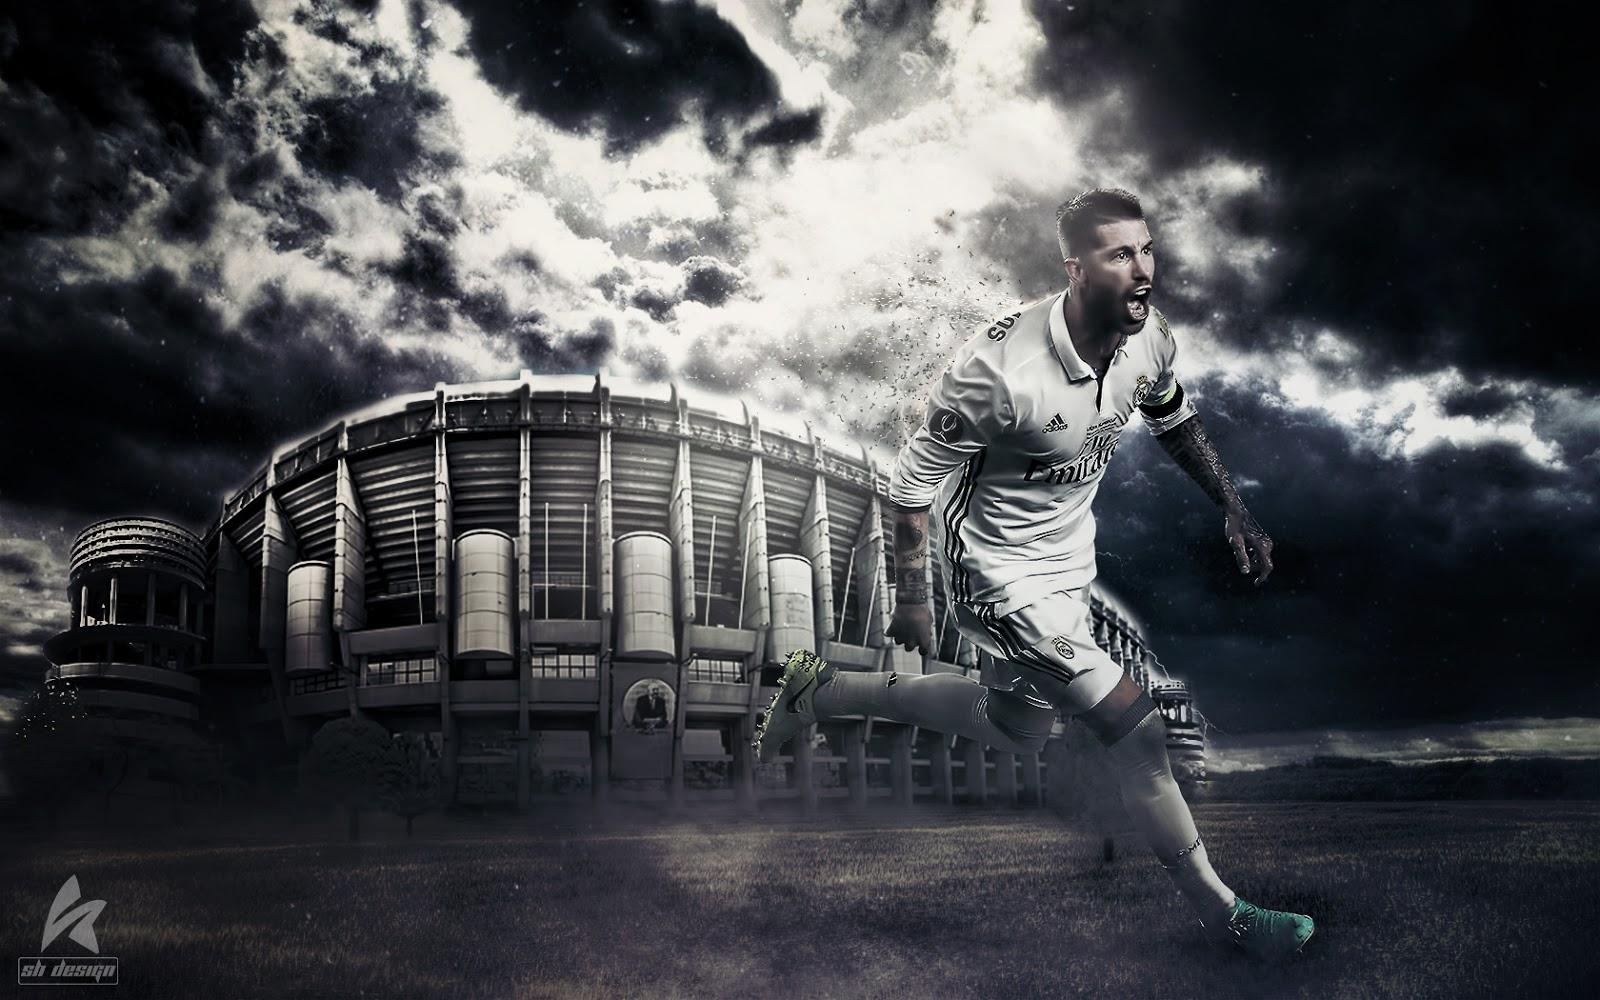 Messi 3d Wallpaper 2017 سيرخيو راموس صور وخلفيات 2017 صور وخلفيات نجم ريال مدريد